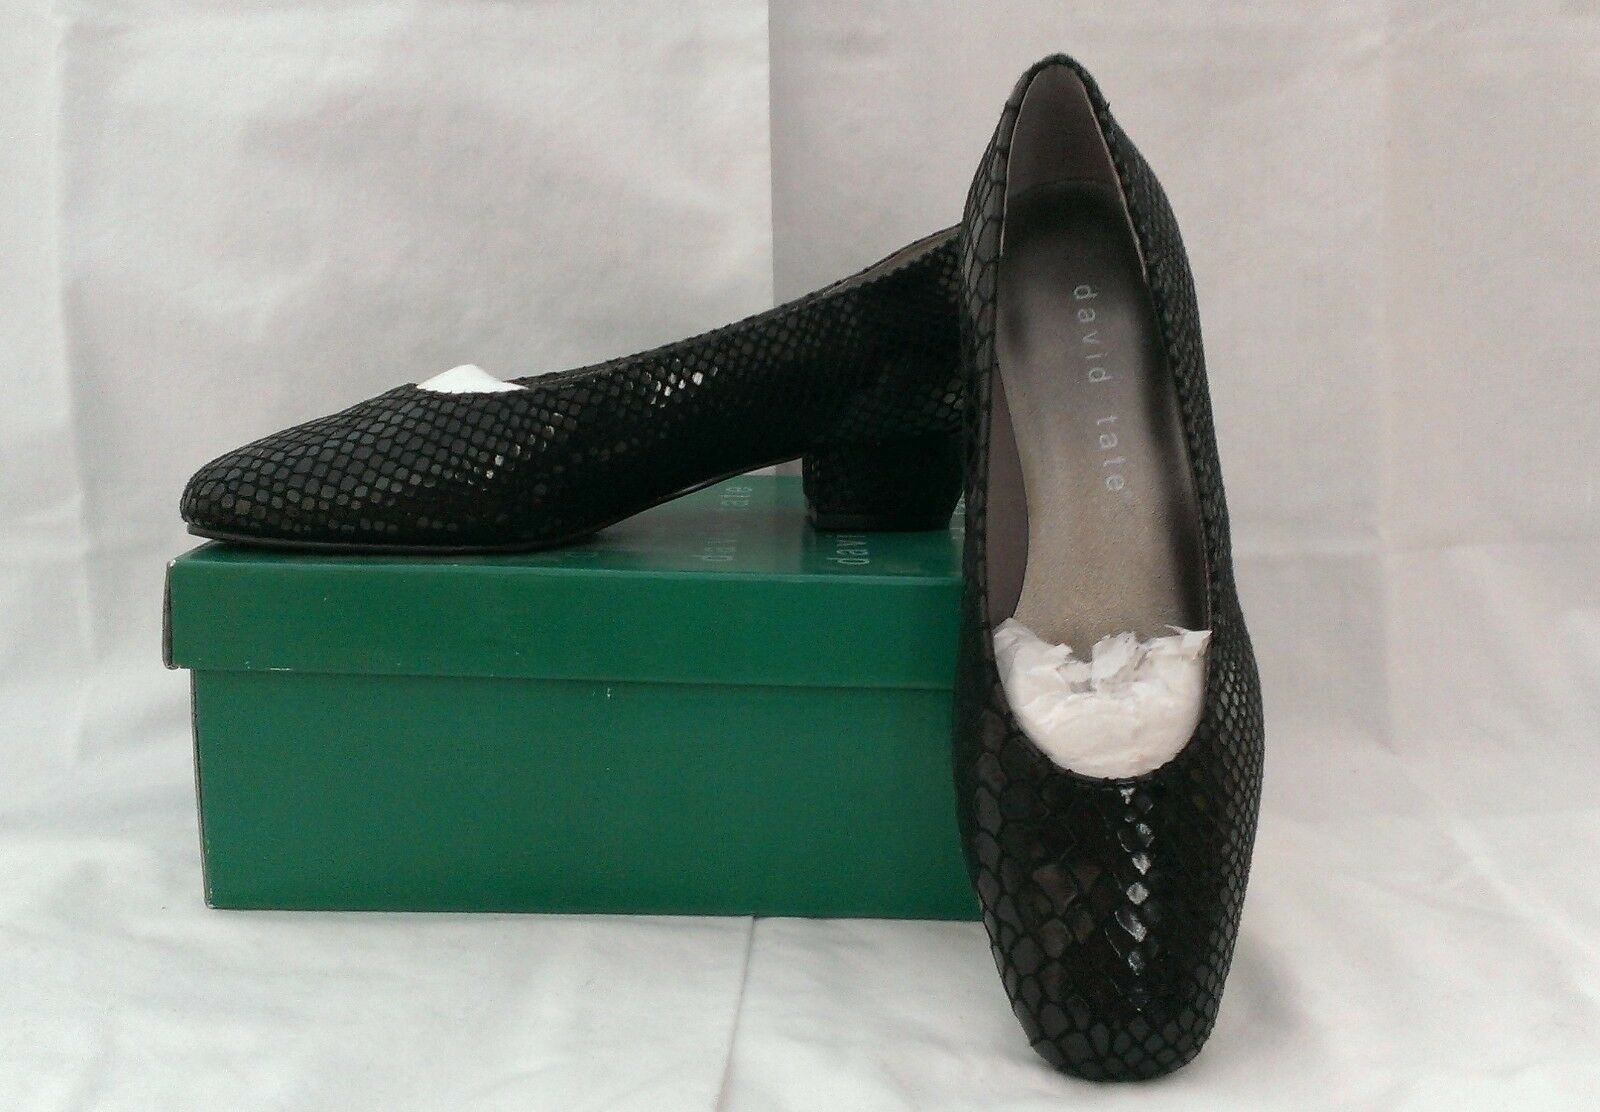 DAVID TATE Print LIZ Loafer Black Snake Print TATE Womens Shoes Size 6 Medium MSRP $70 NWB 6d464c